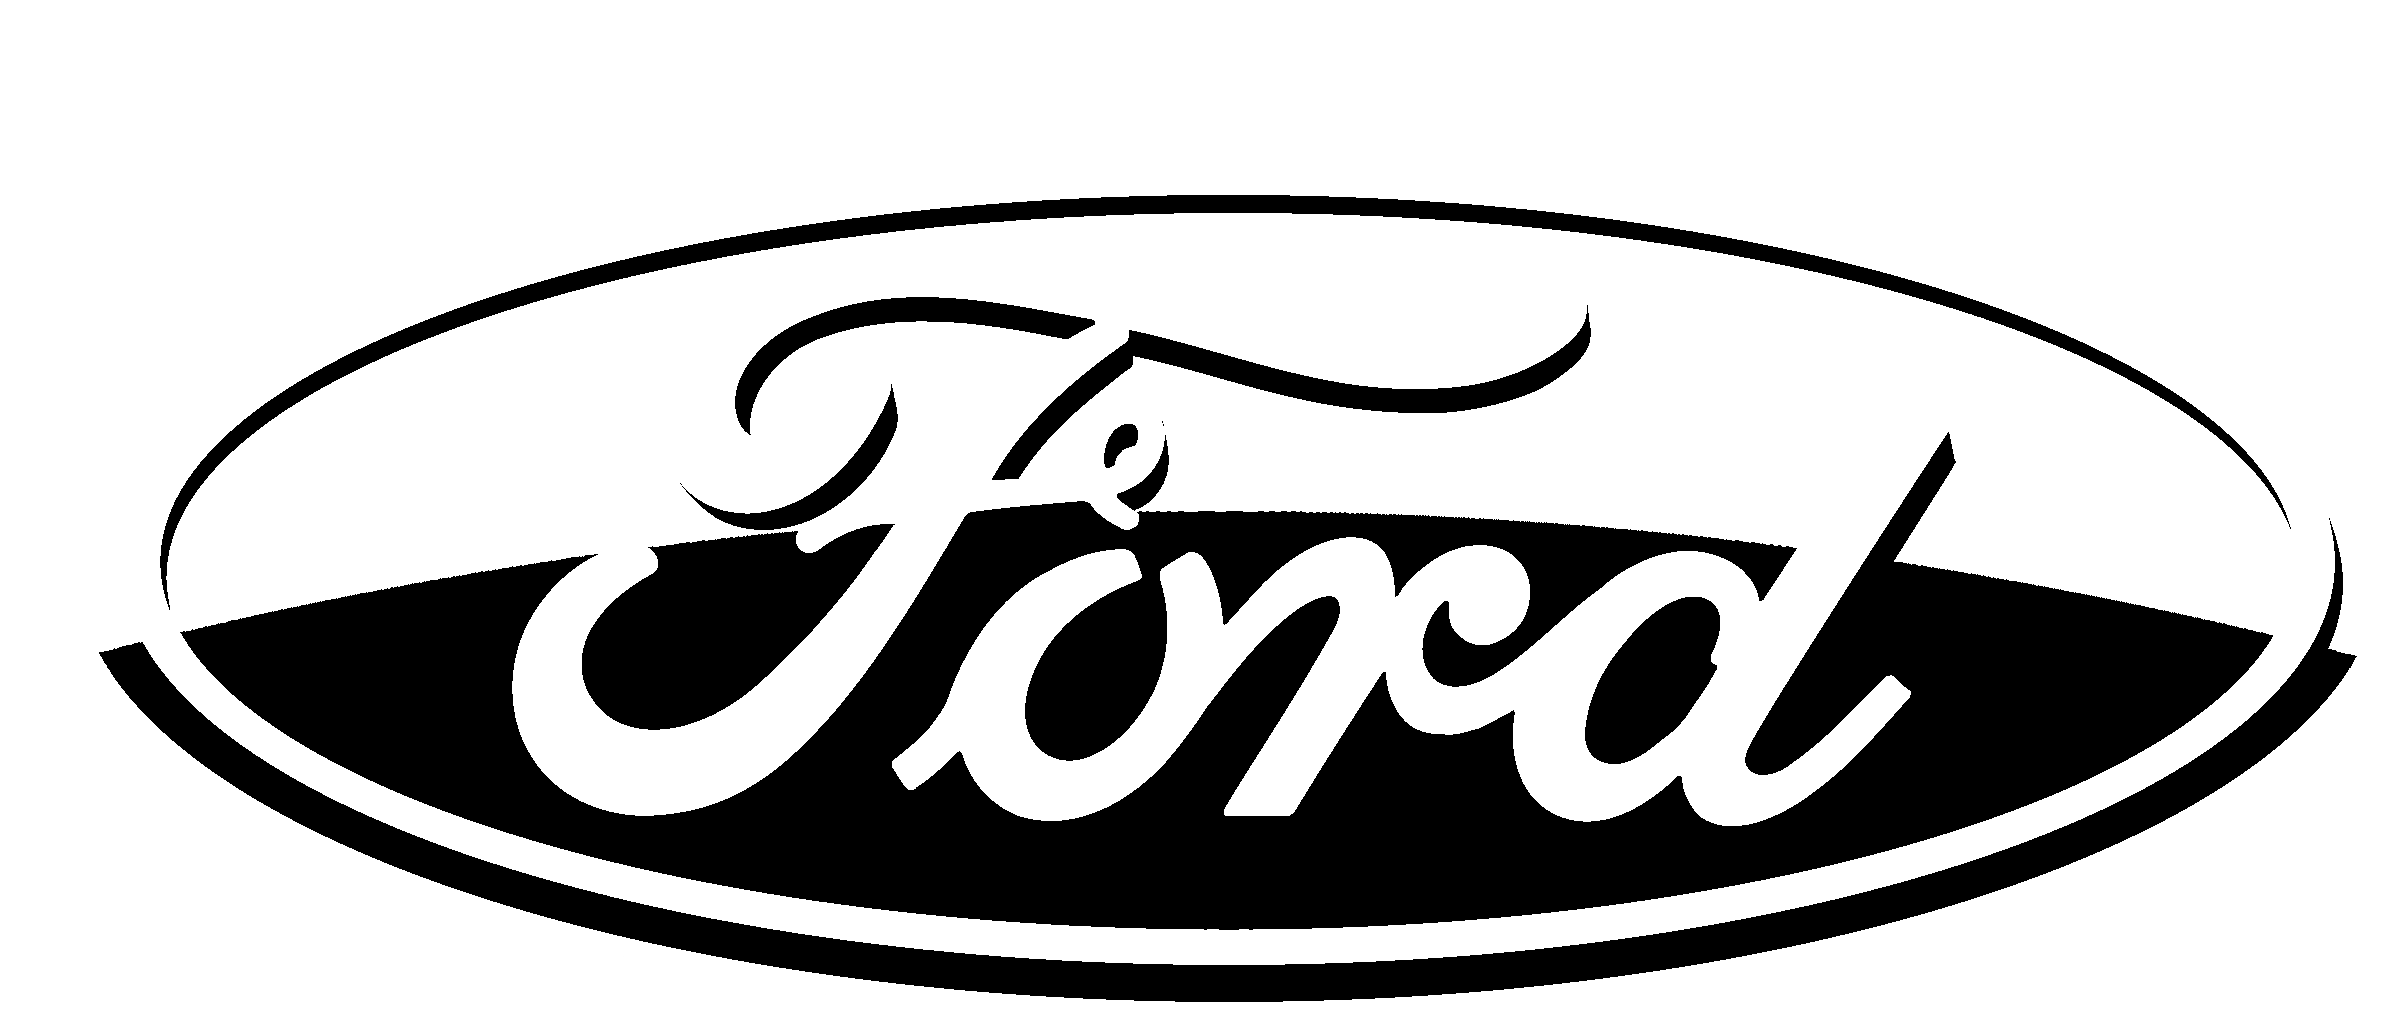 Ford Logo Png Transparent & Amp Svg Vector Freebie Supply